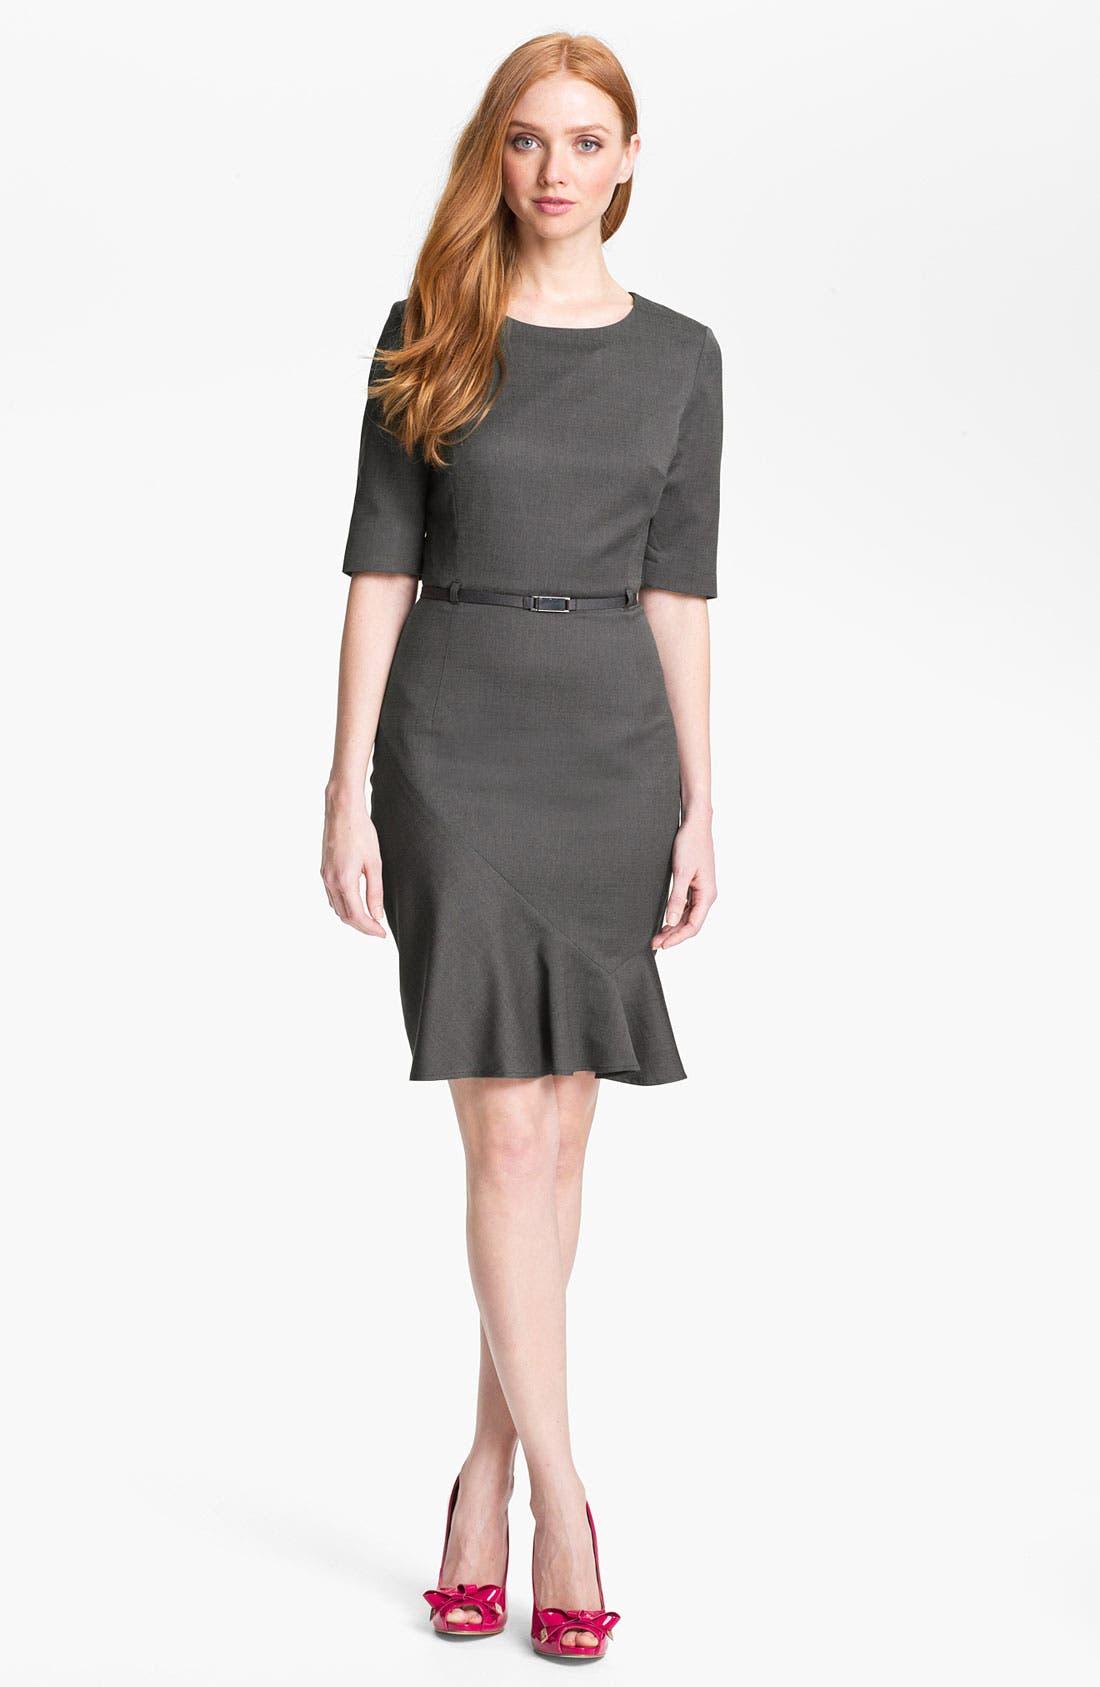 Alternate Image 1 Selected - Ted Baker London 'Tonic' Stretch Sheath Dress